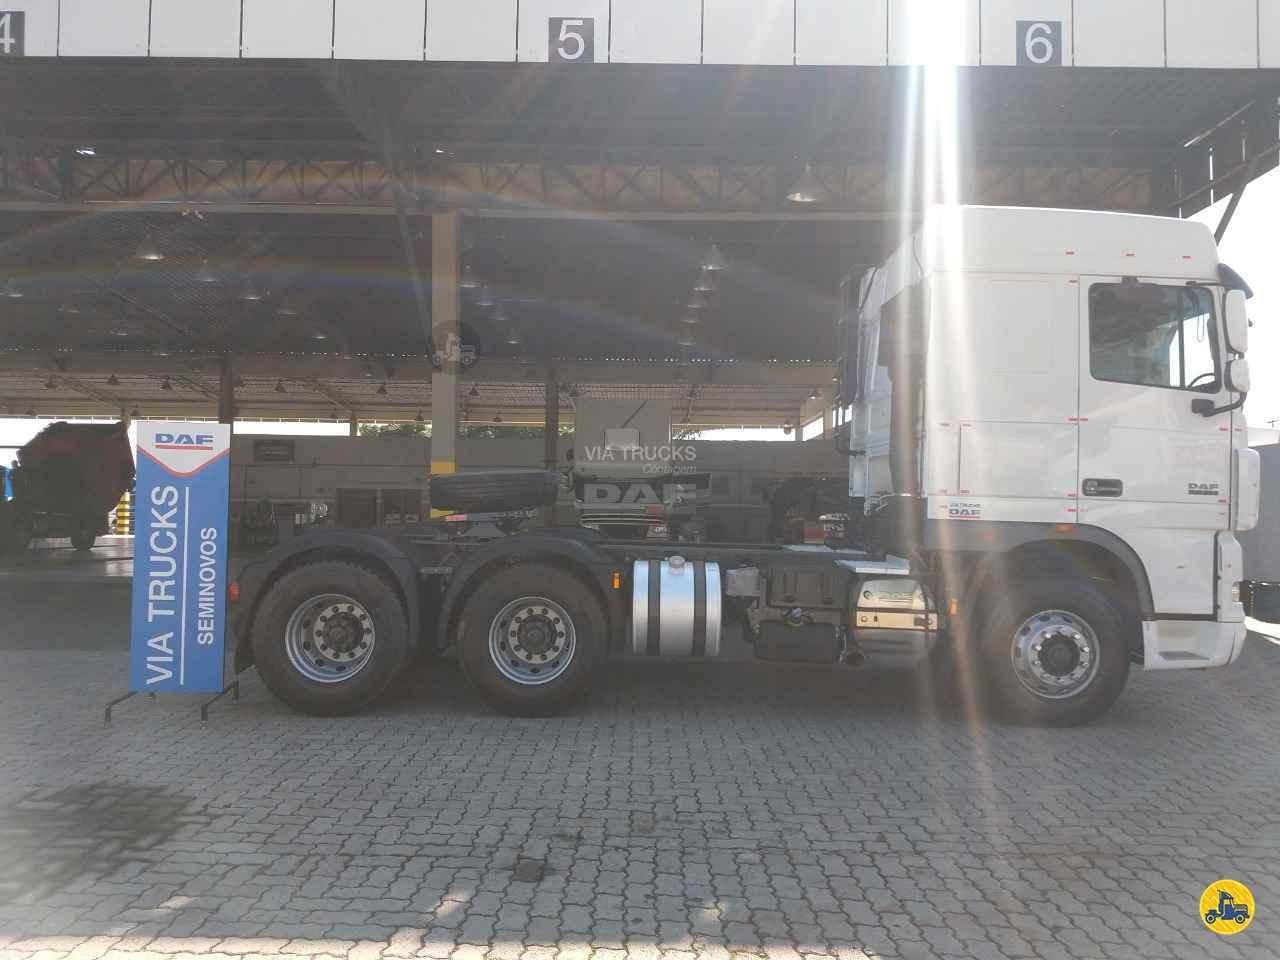 DAF DAF XF105 510 290000km 2016/2017 Via Trucks - DAF